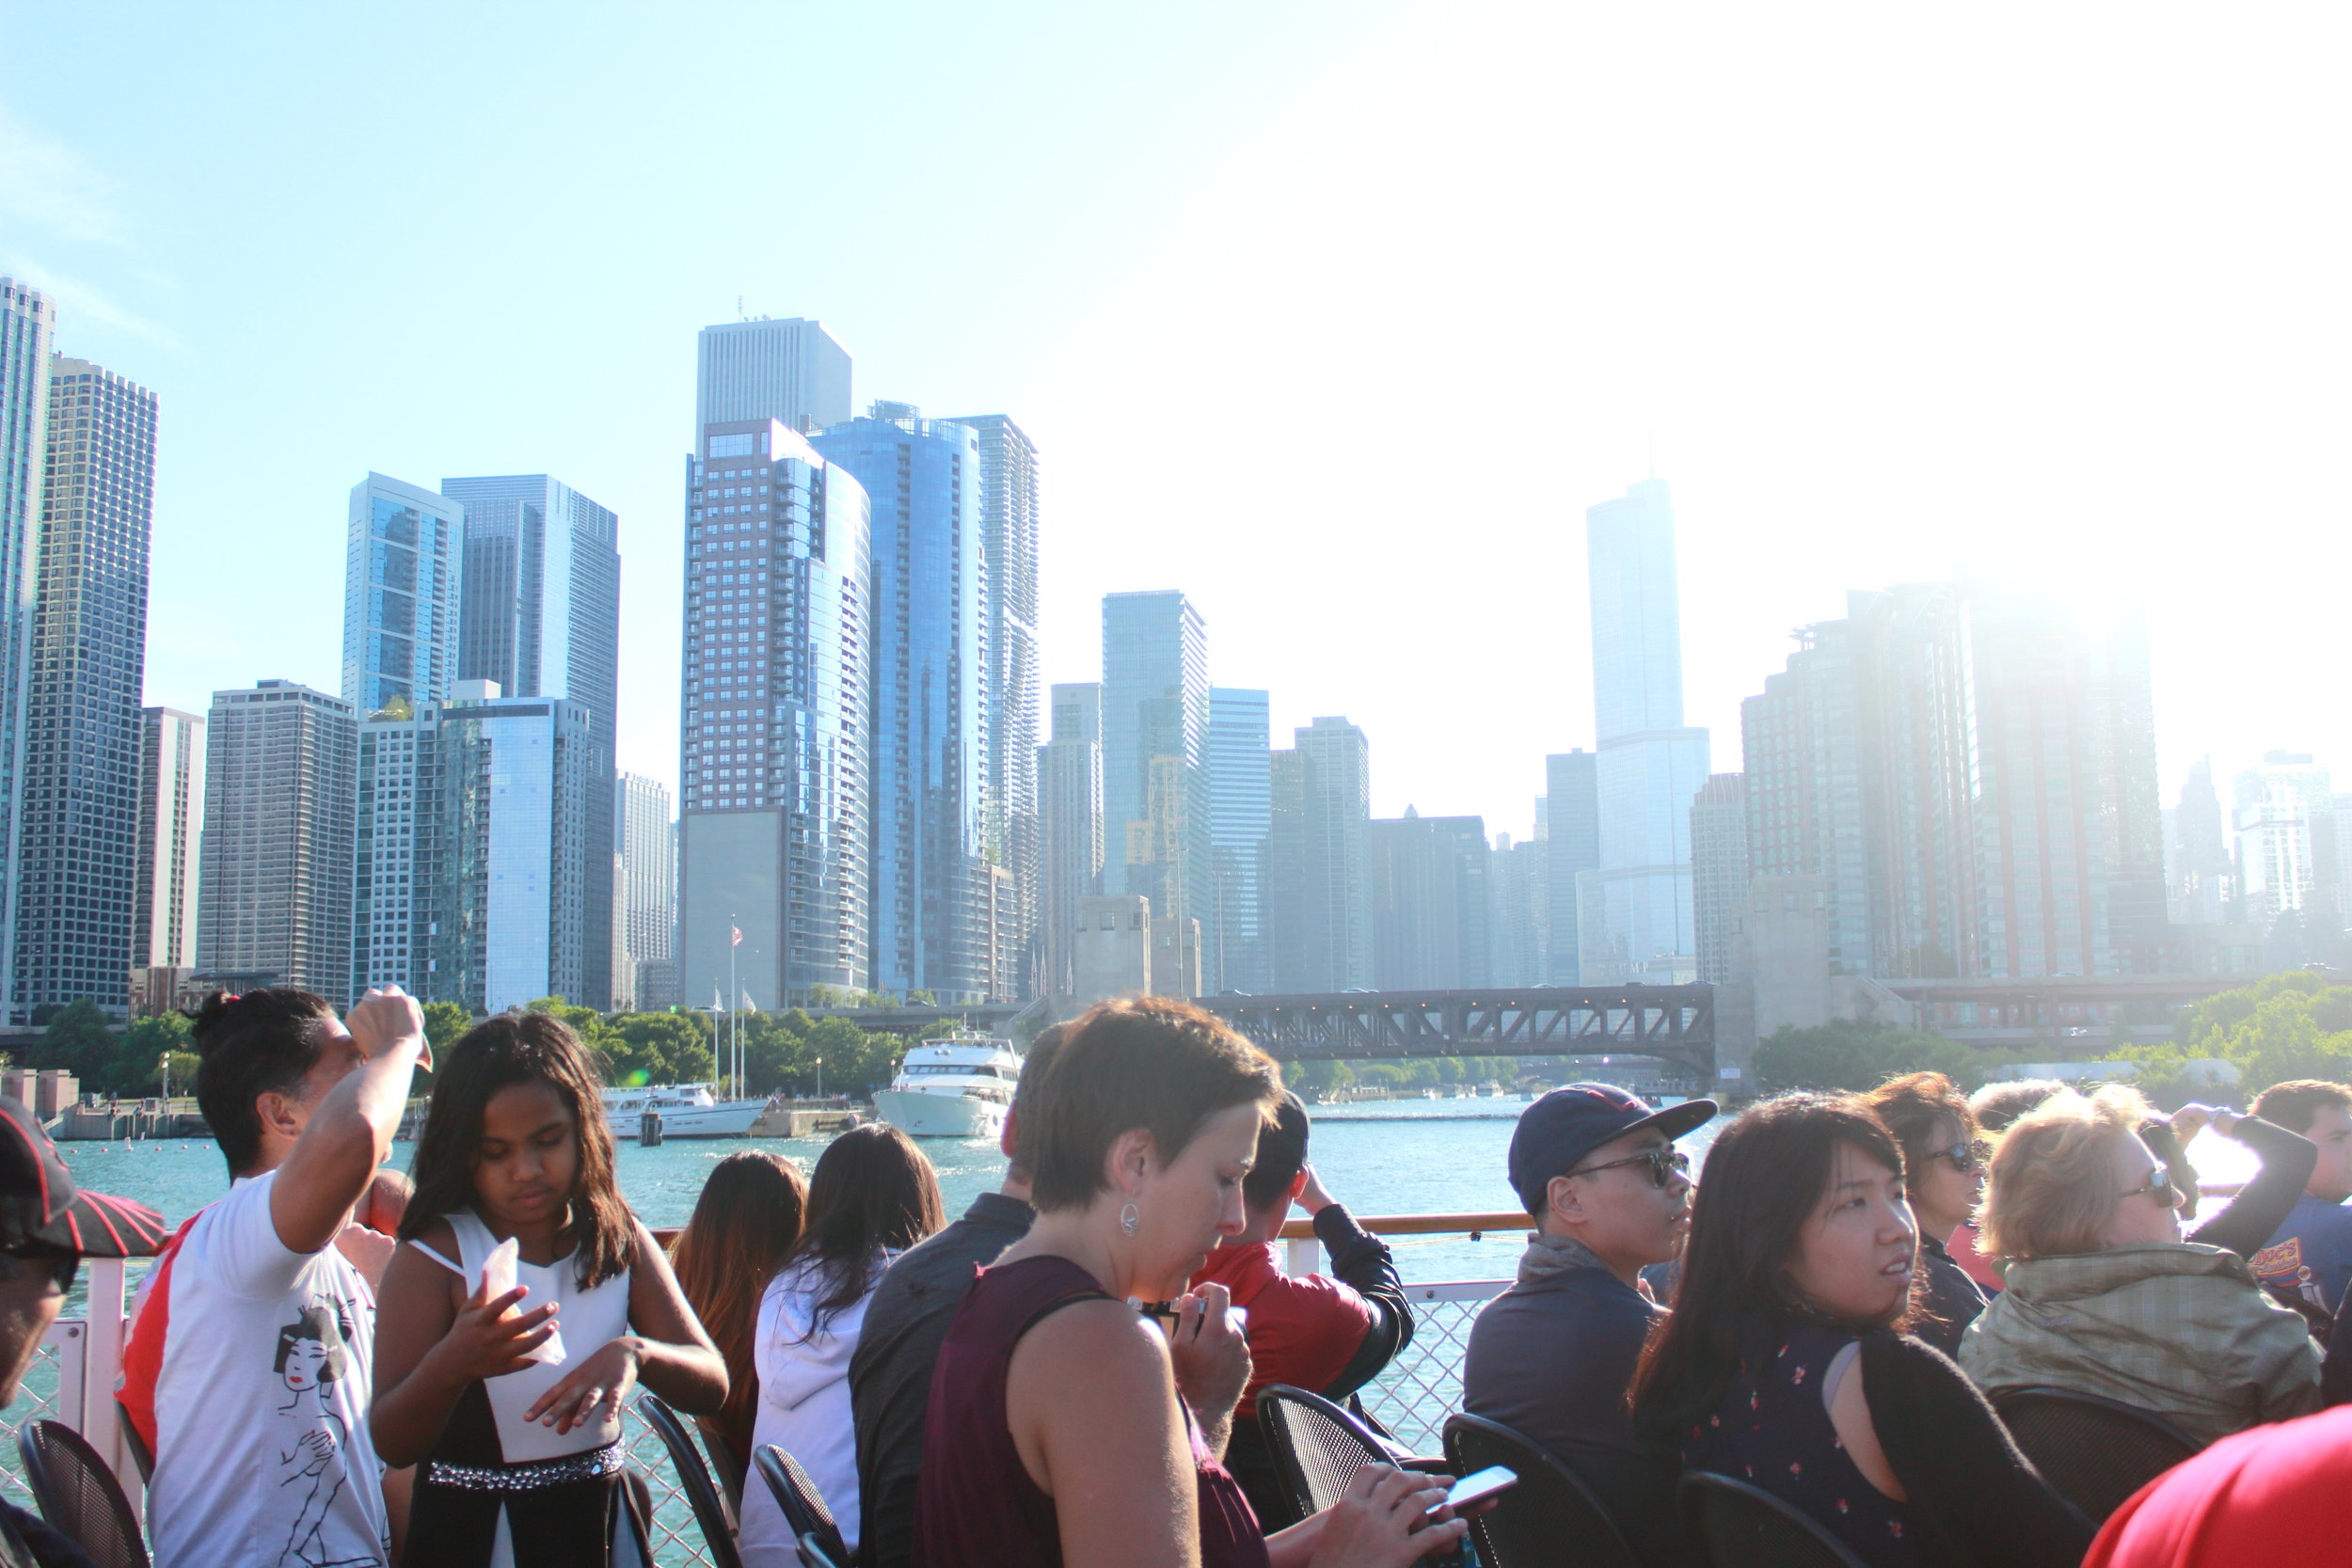 Chicago architectural tour